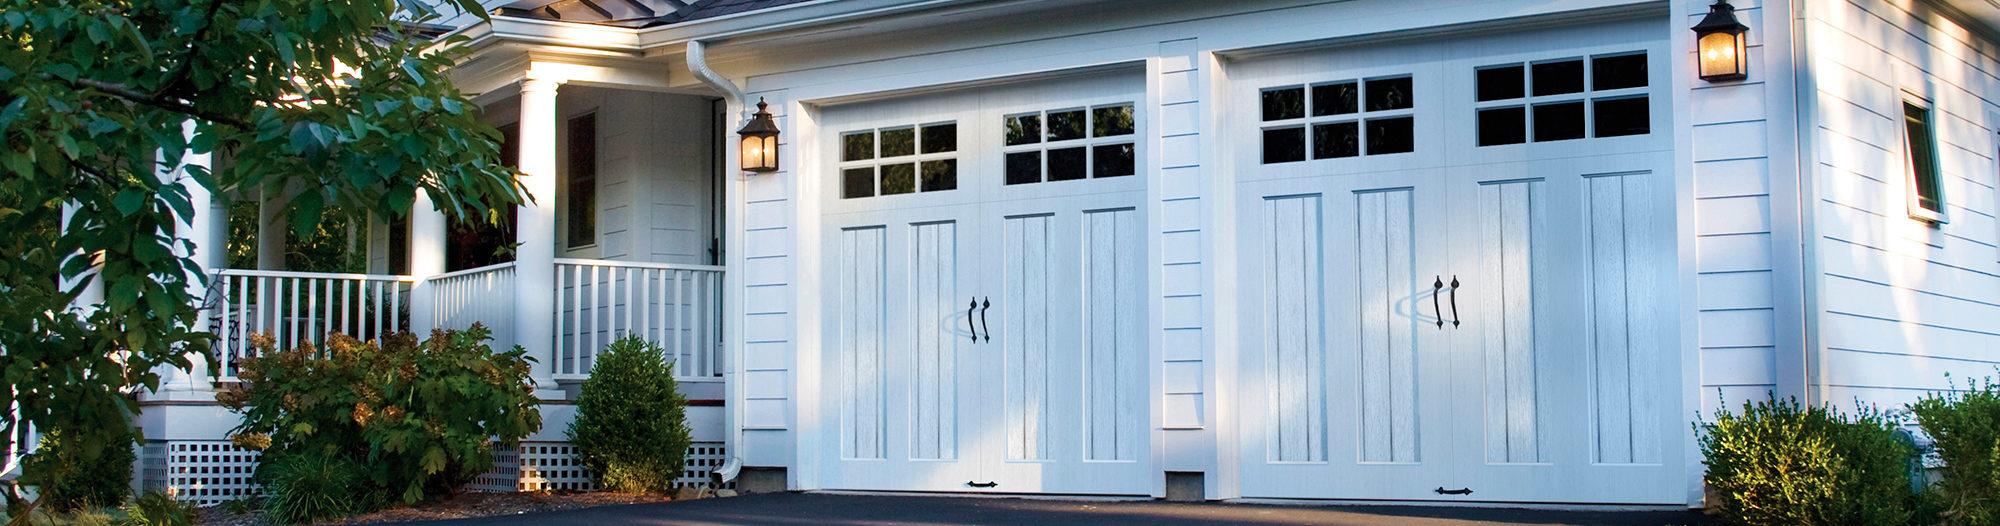 Veteran-Inspired, Christian-Based, Garage Door Service